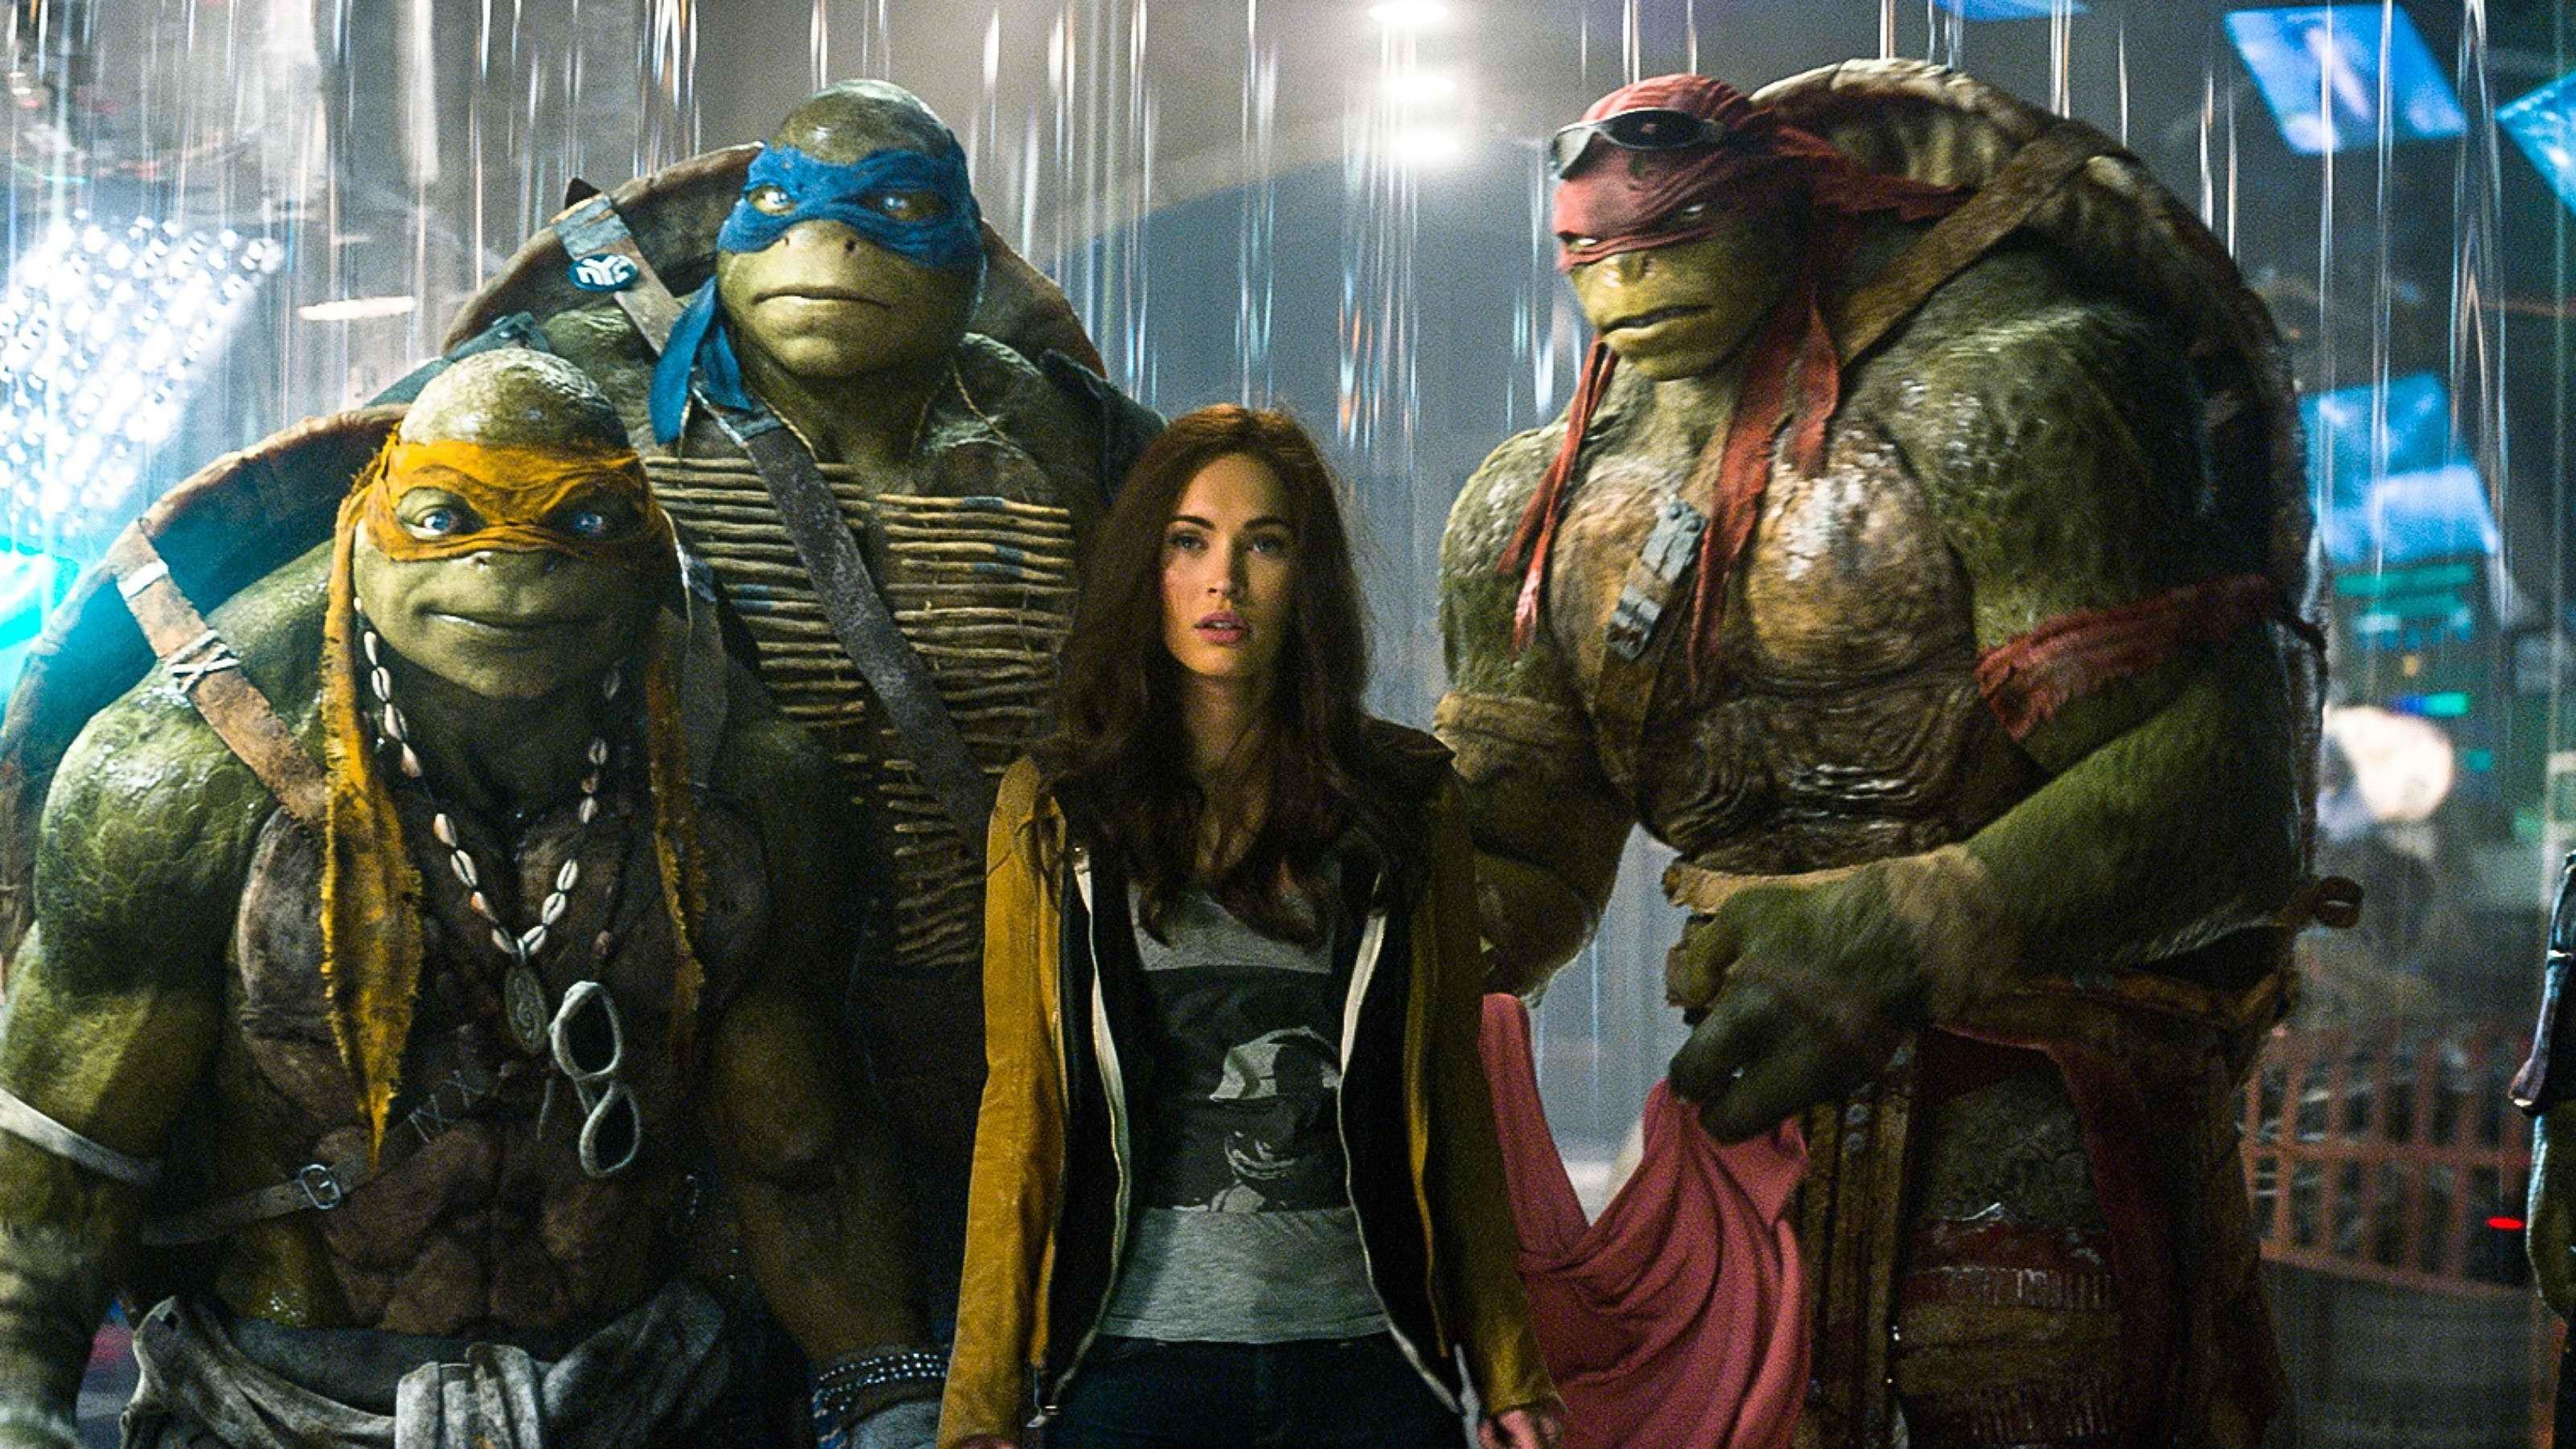 Res: 3200x1800, Teenage Mutant Ninja Turtles 2014 Film Poster | Wallpapers HD .